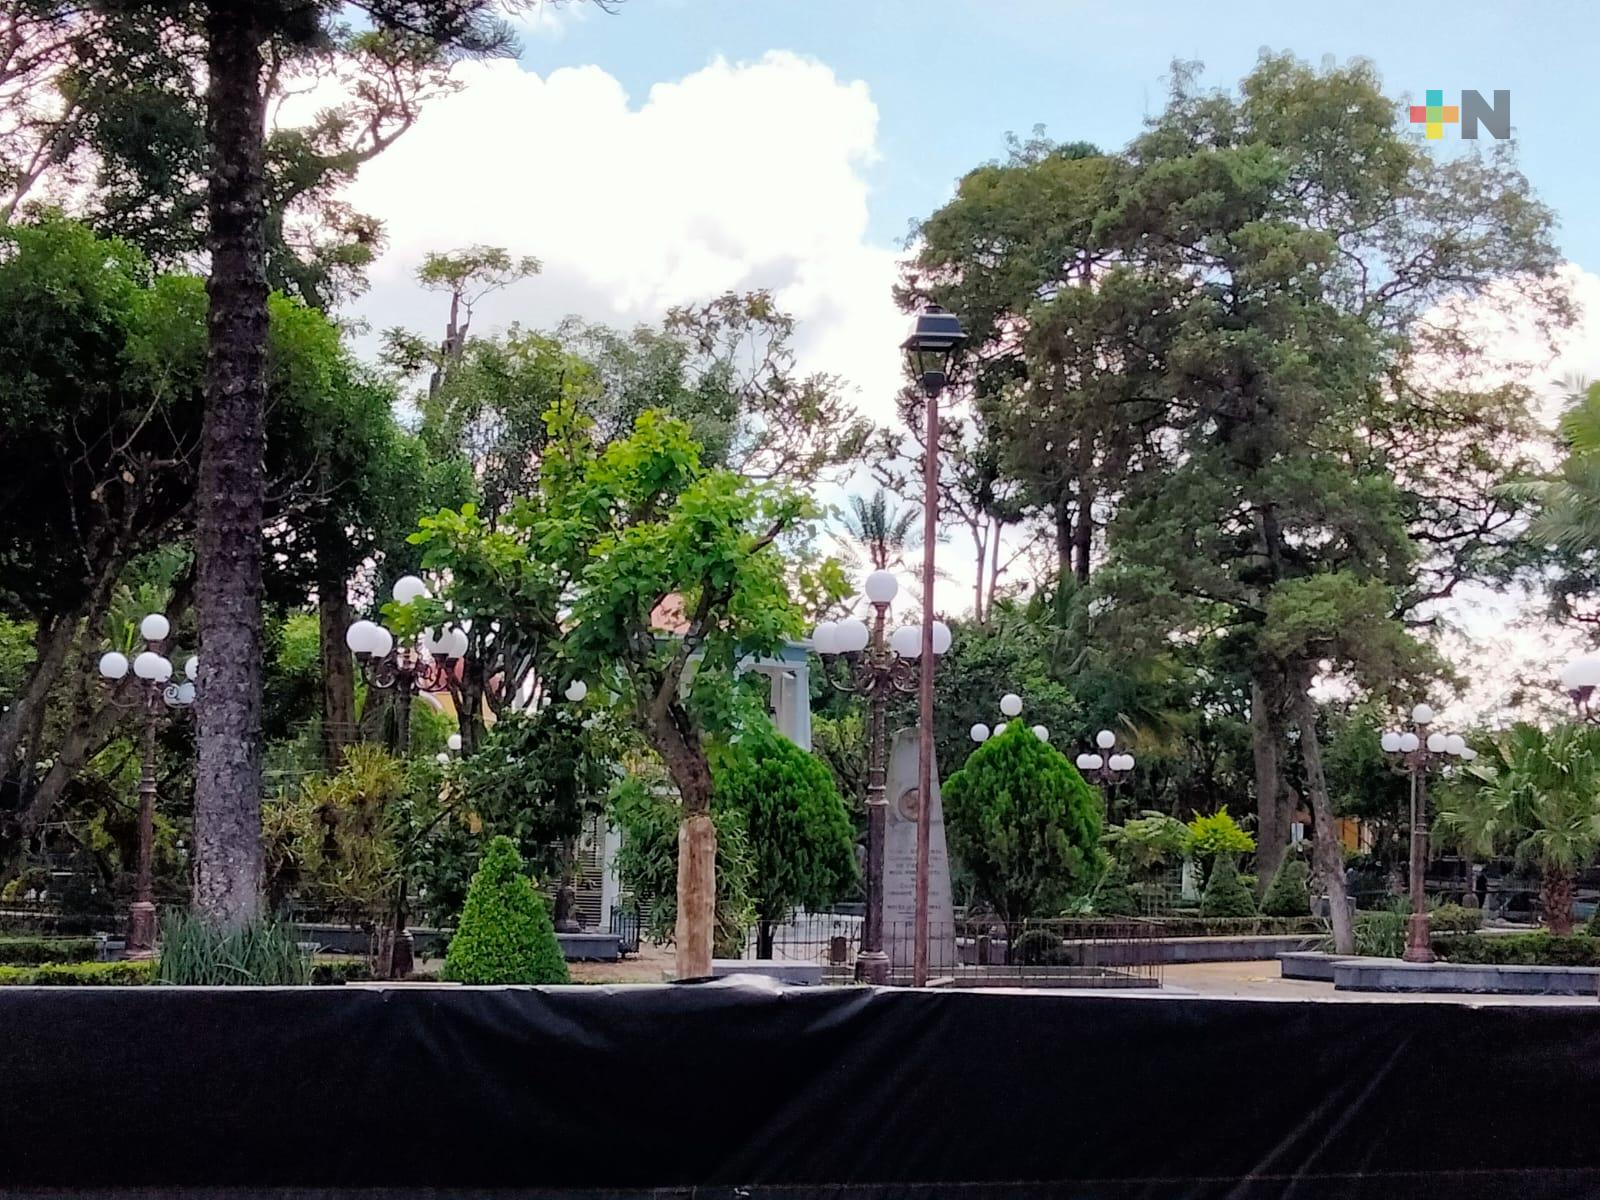 Por concluir rehabilitación del parque de Coatepec, apertura depender´a de semáforo epidemiológico